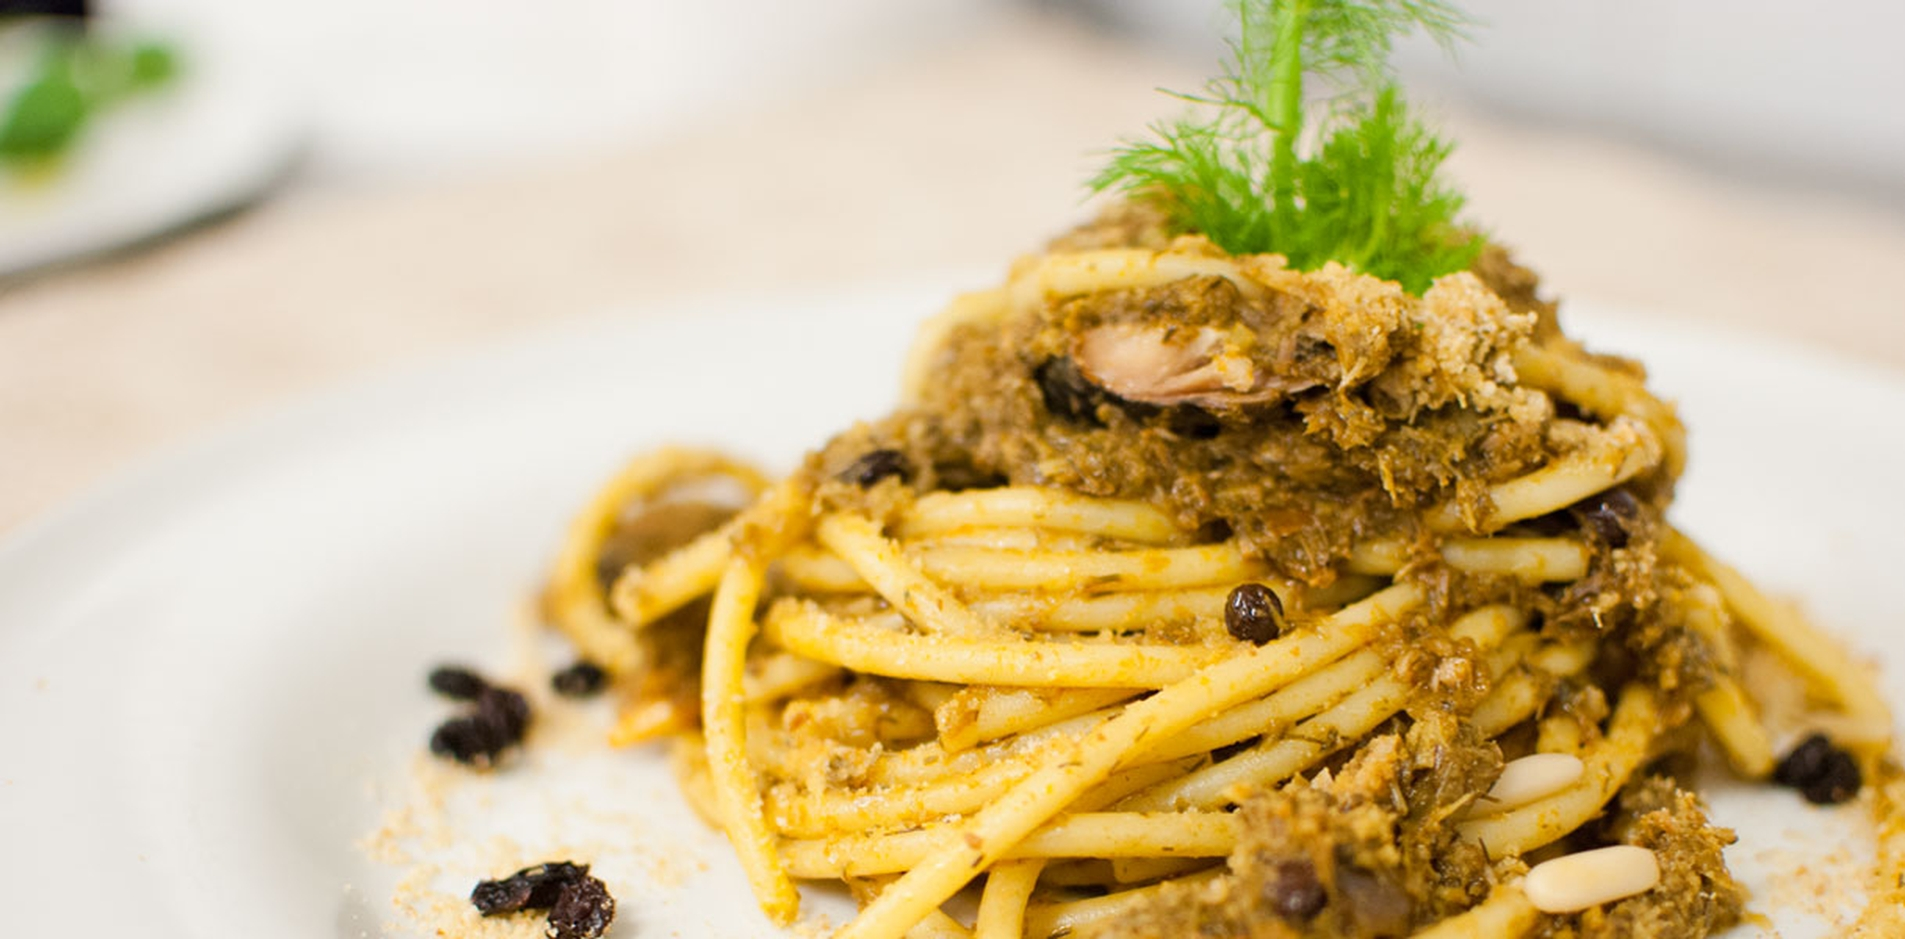 Antica focacceria s francesco home - Antica cucina siciliana ...